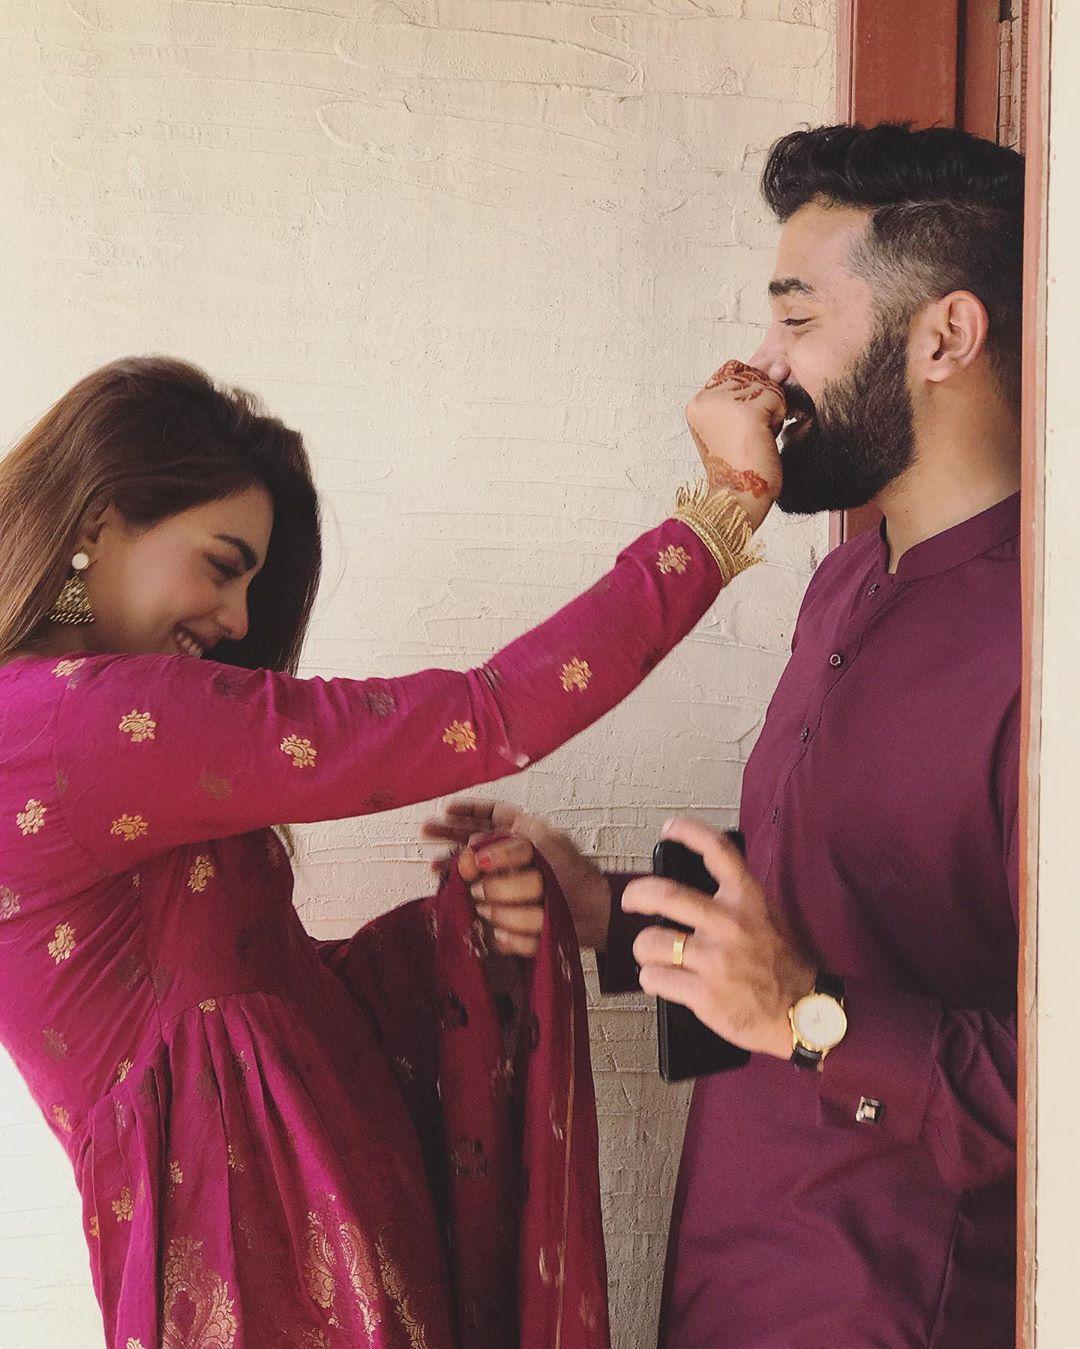 Beautiful Anumta Qureshi Clicks with her Husband